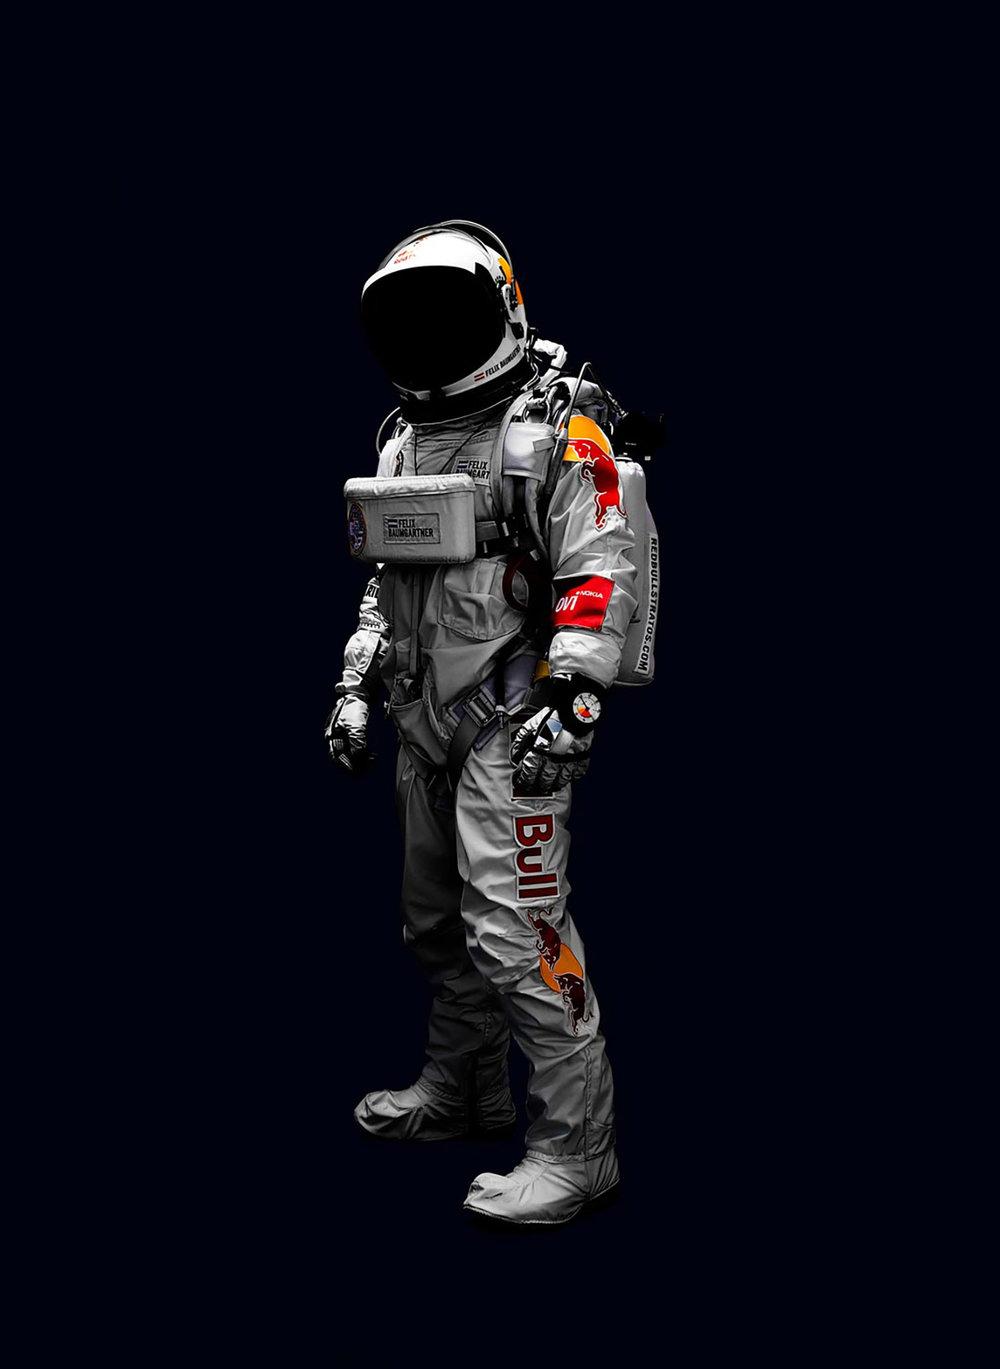 Skydiver Felix Baumgartner in his Red Bull Stratos Space Diving Suit